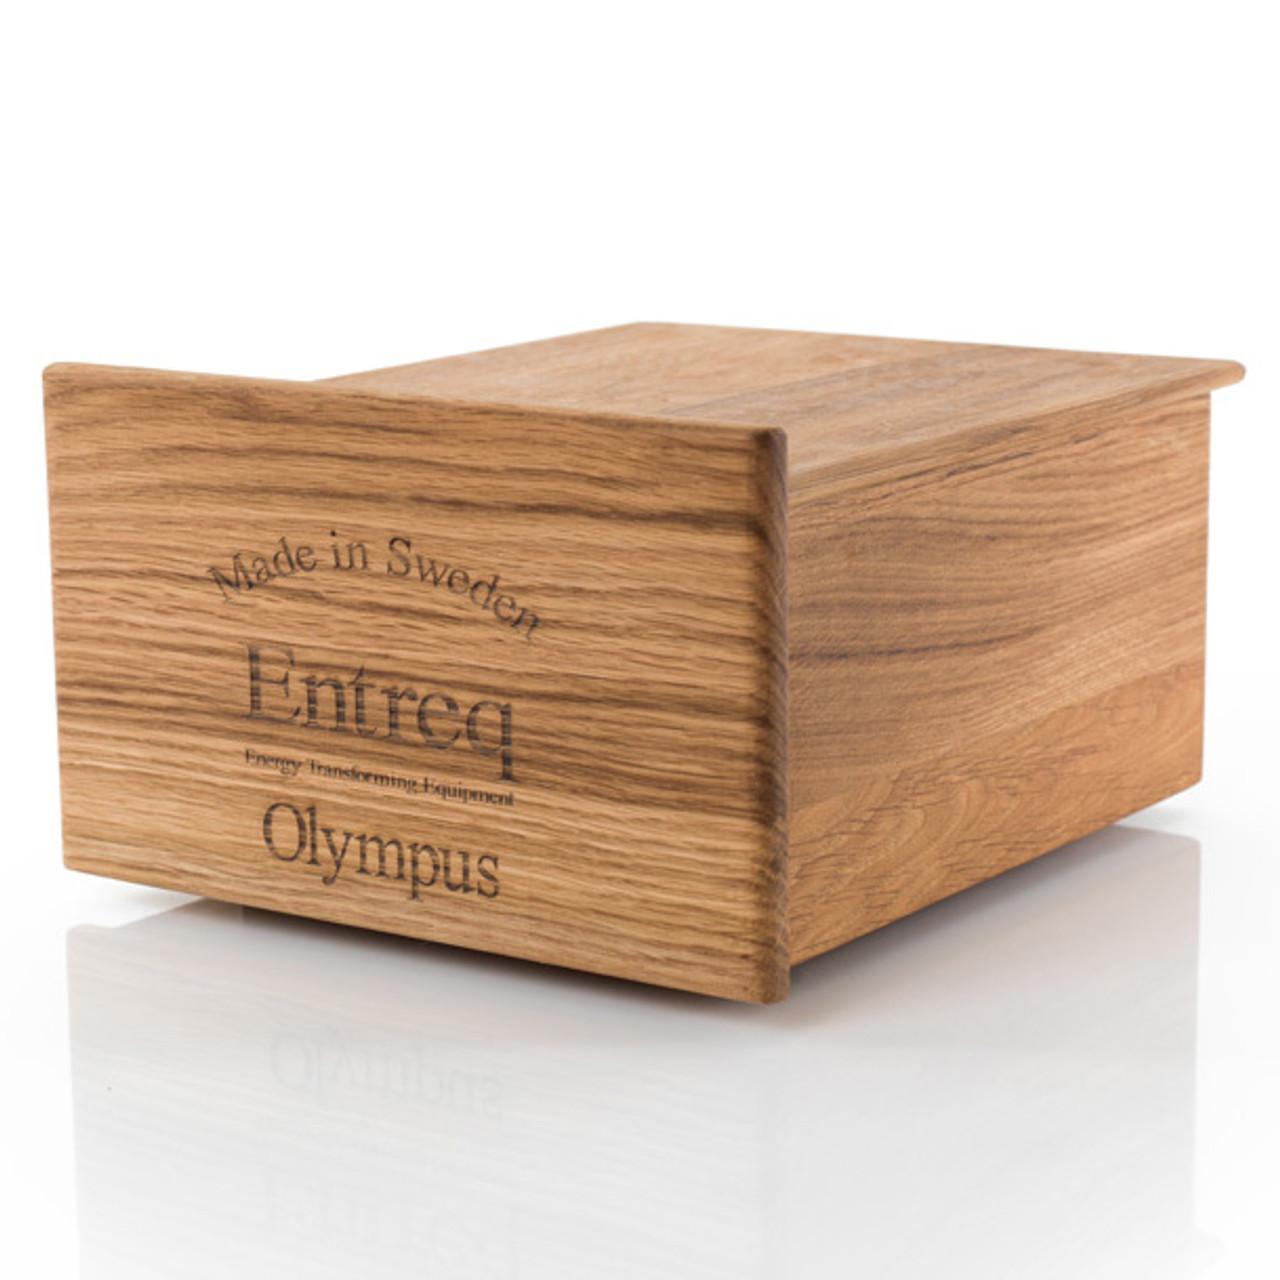 Entreq Olympus Infinity Ground Conditioner ex-trade